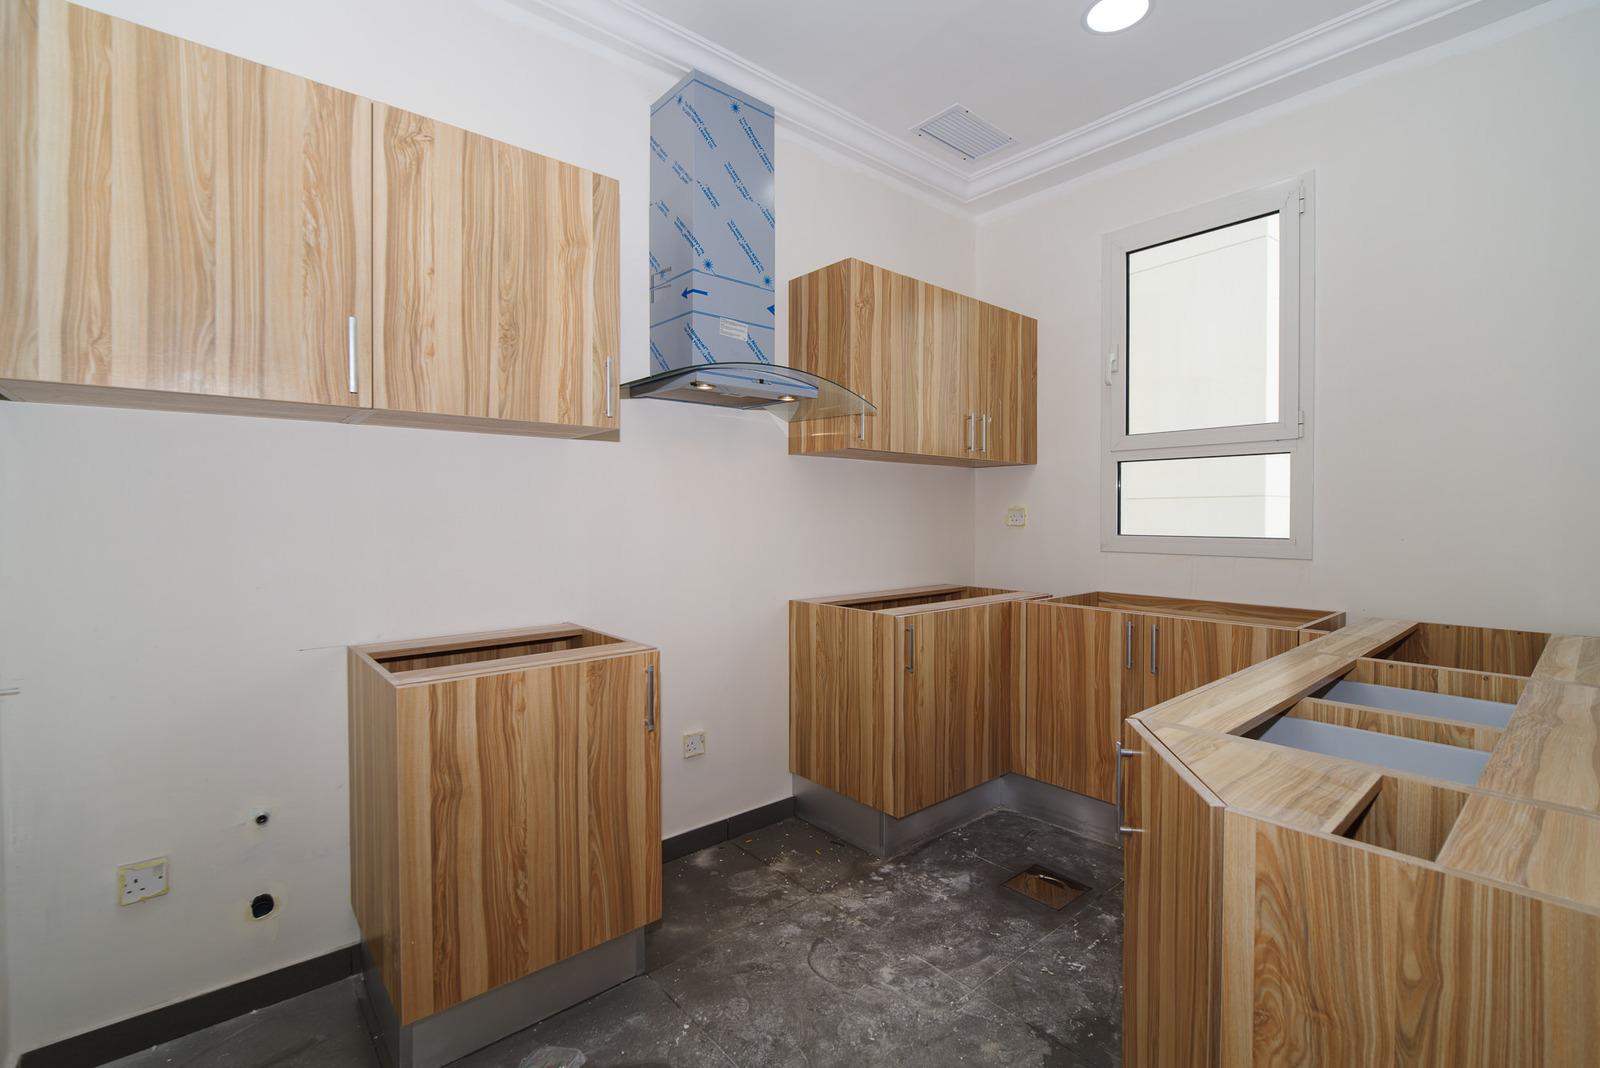 Salmiya Small Brand New Two Bedroom Apartments Horizon Q8